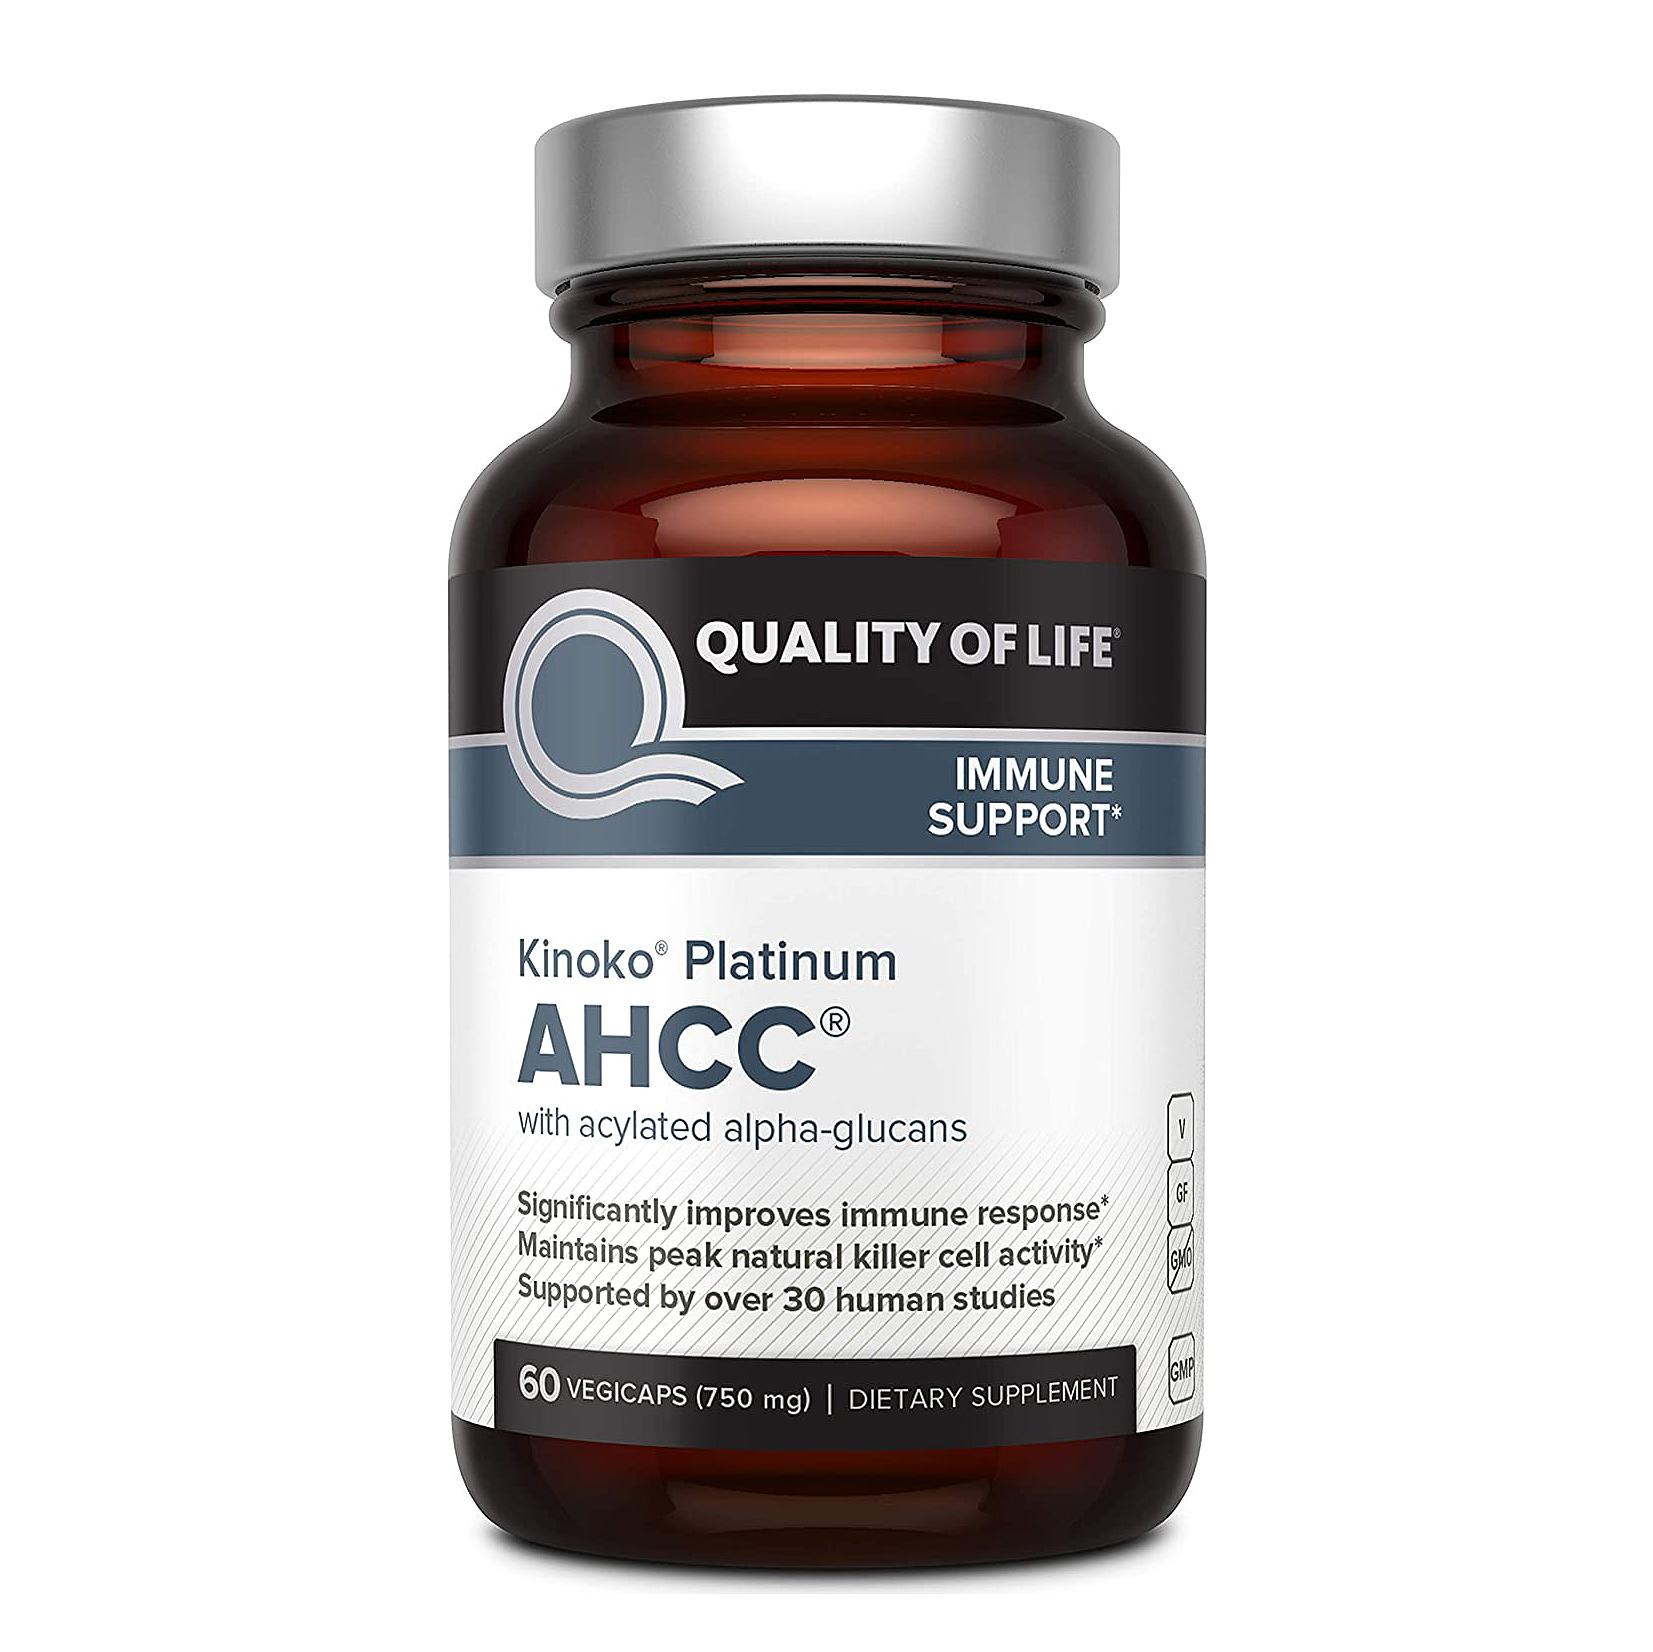 Quality of Life Kinoko Platinum AHCC Supplement